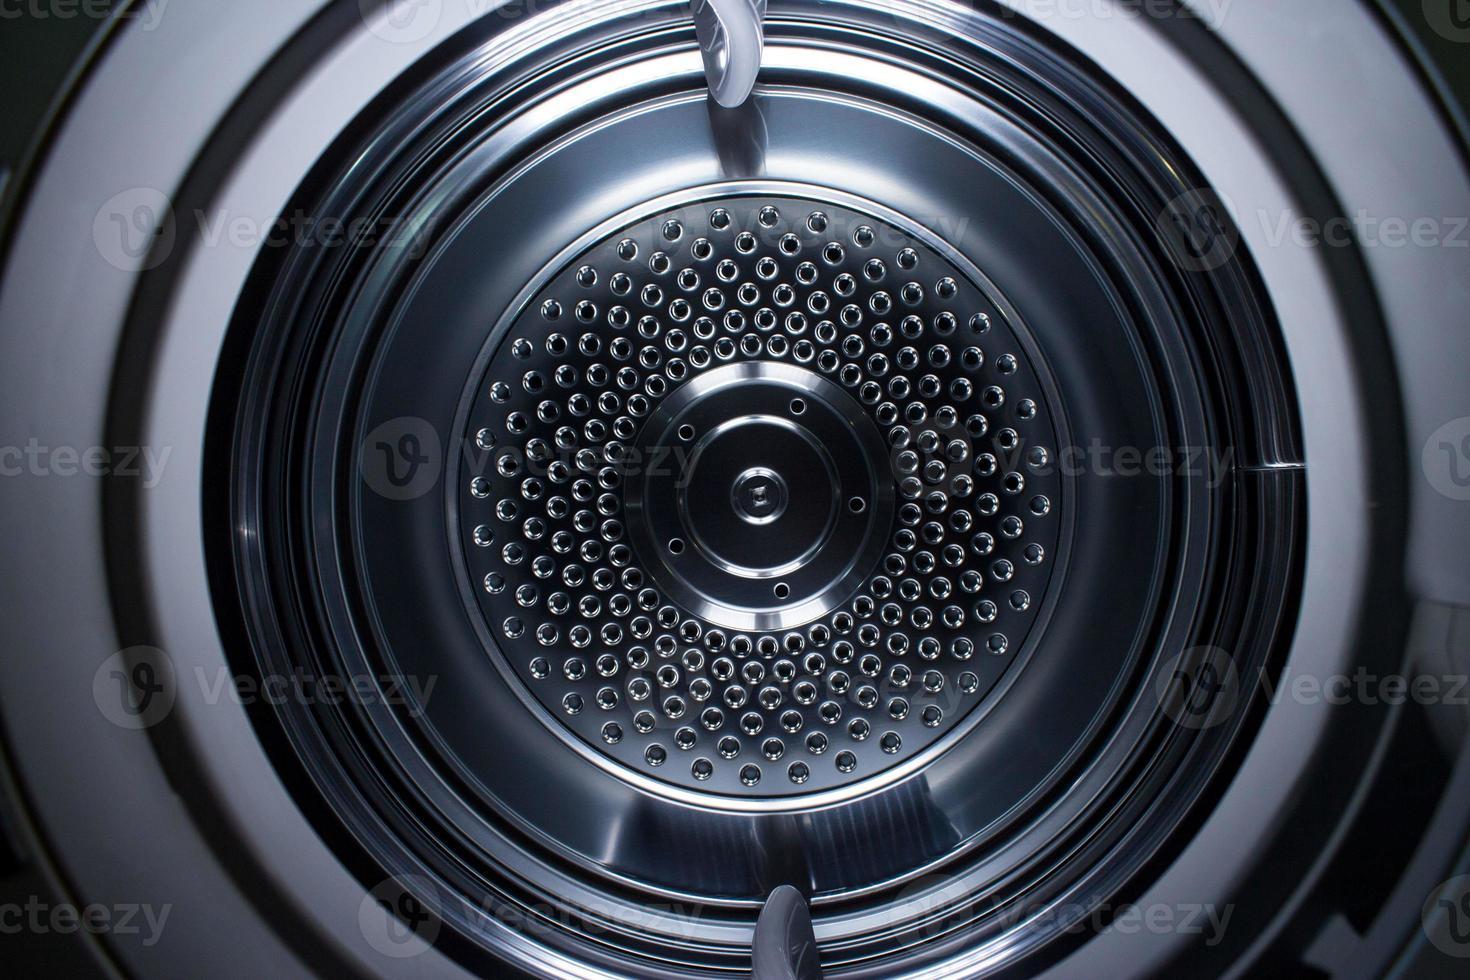 Inside of a dryer machine. photo